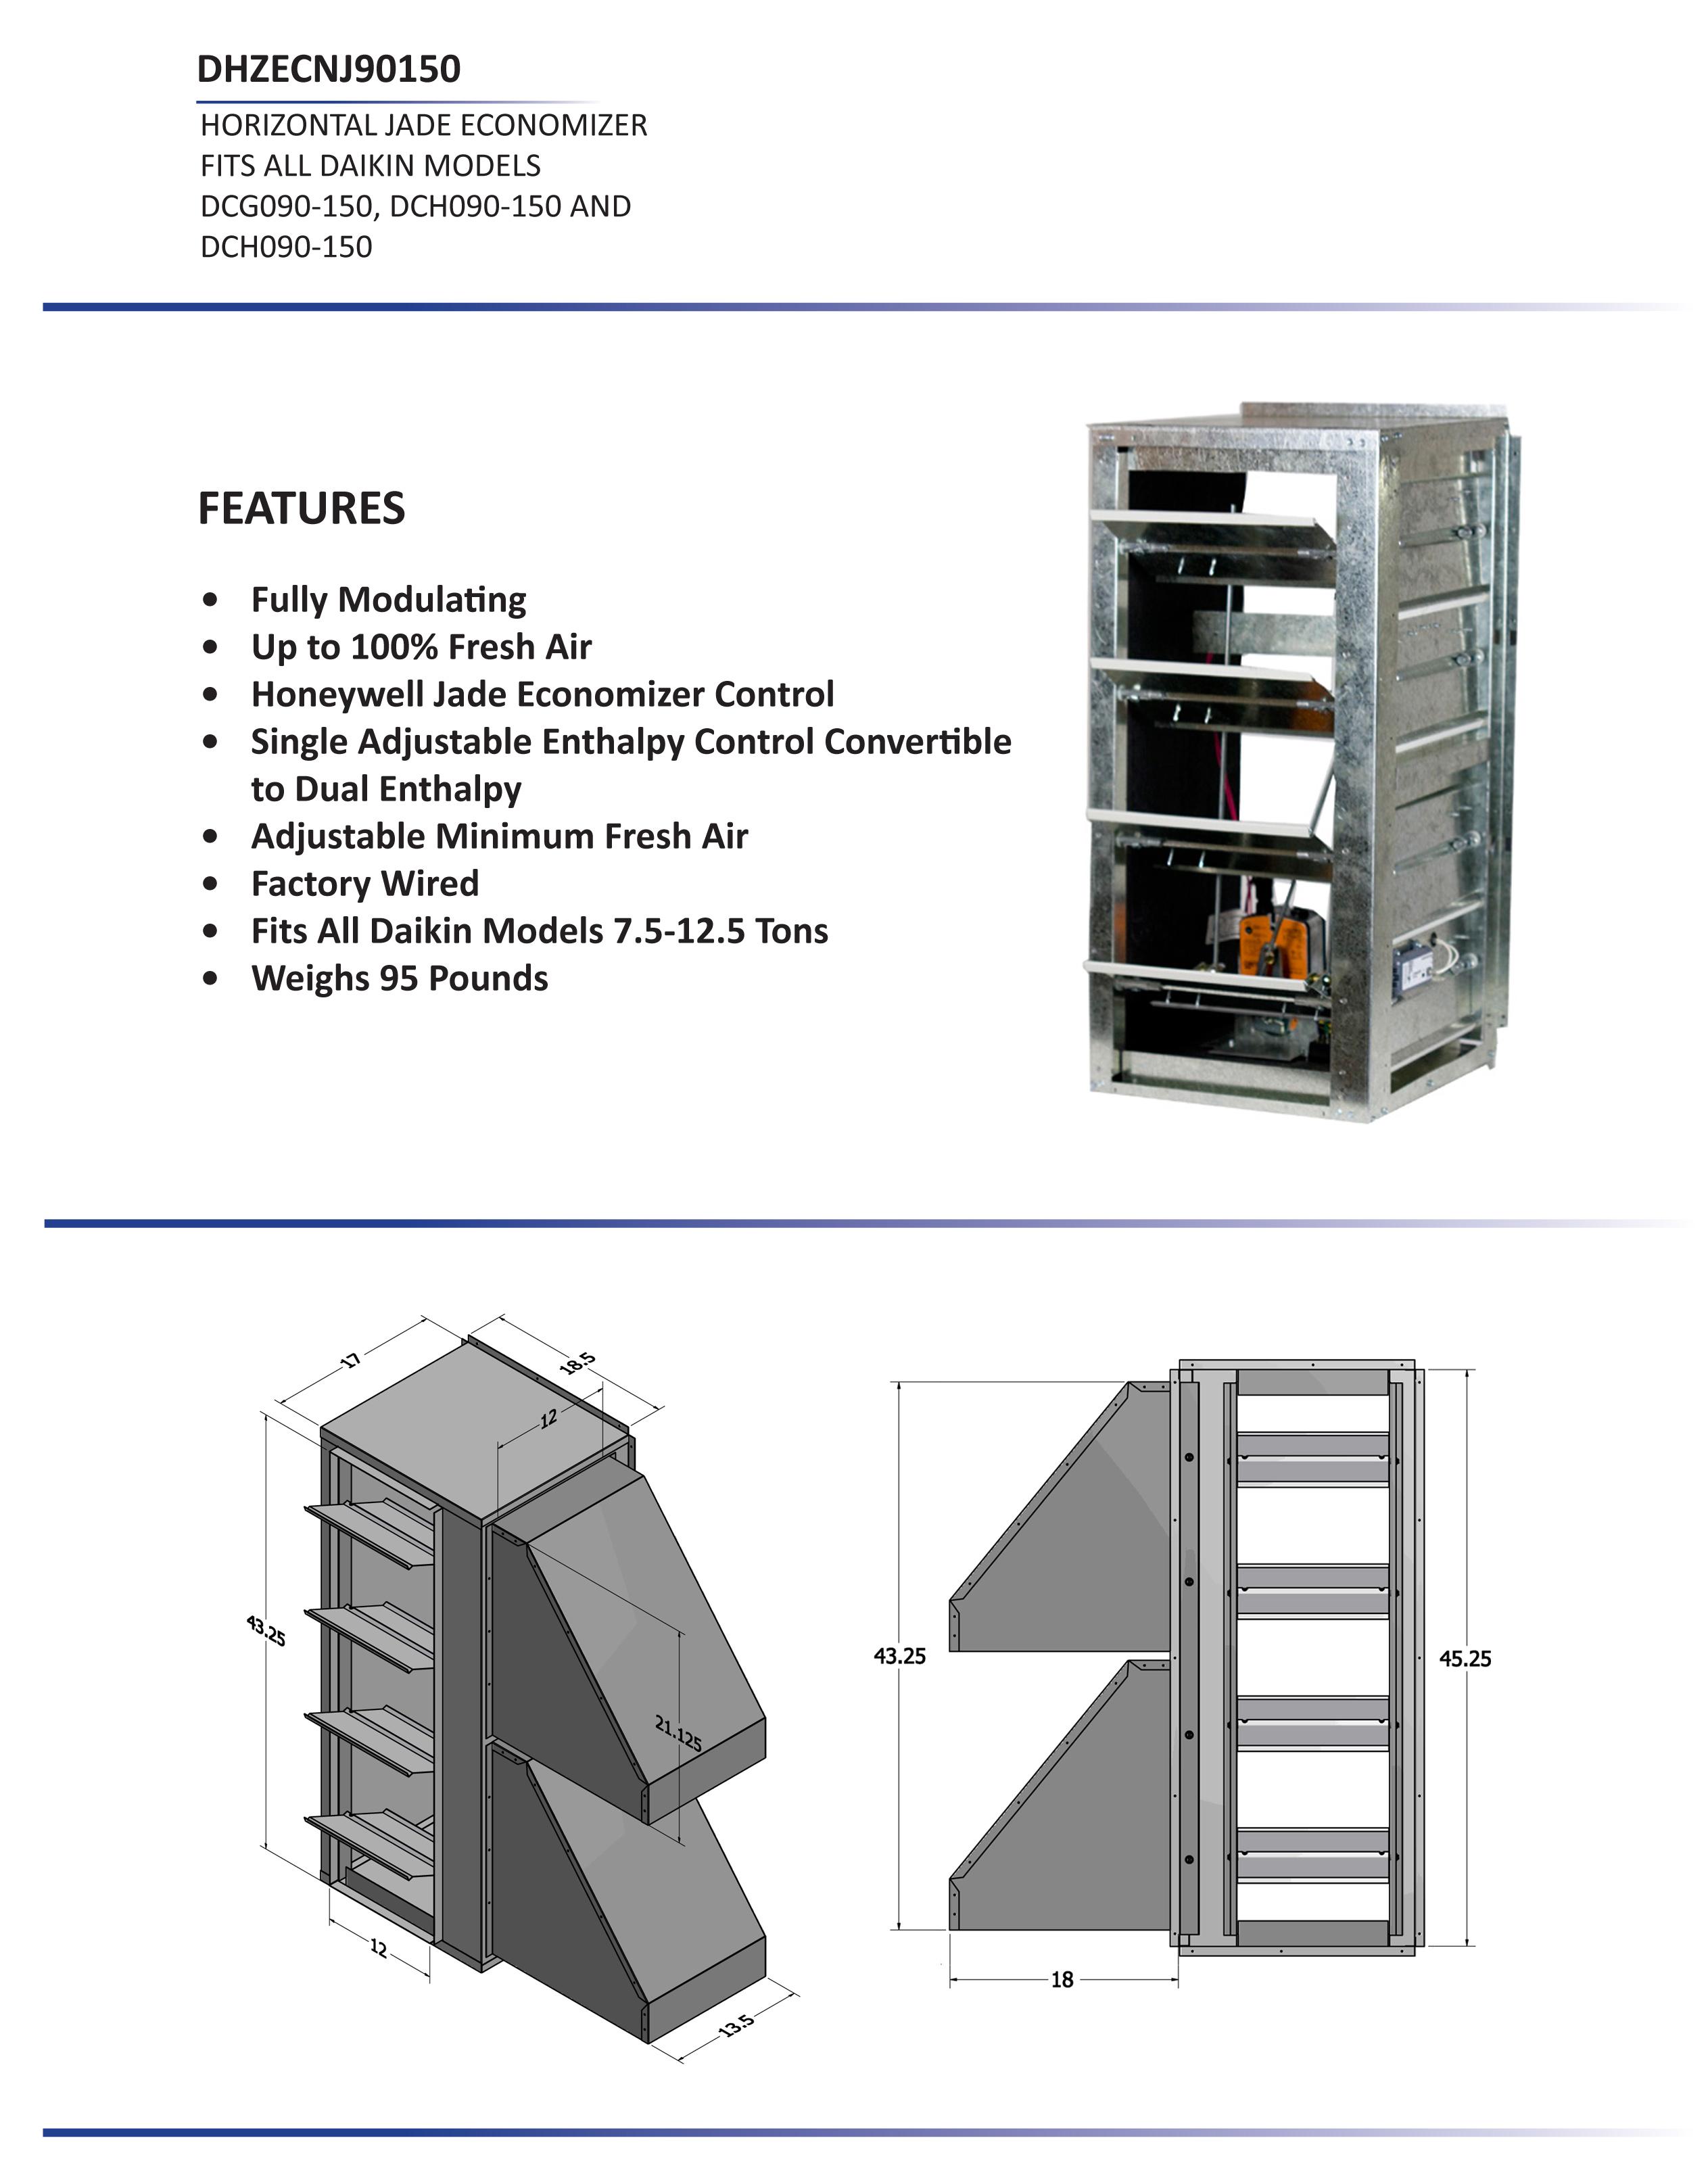 daikin split ac 1 5 ton wiring diagram mcdonnell miller low water cutoff 7 12 horizontal economizer dcc dcg dch